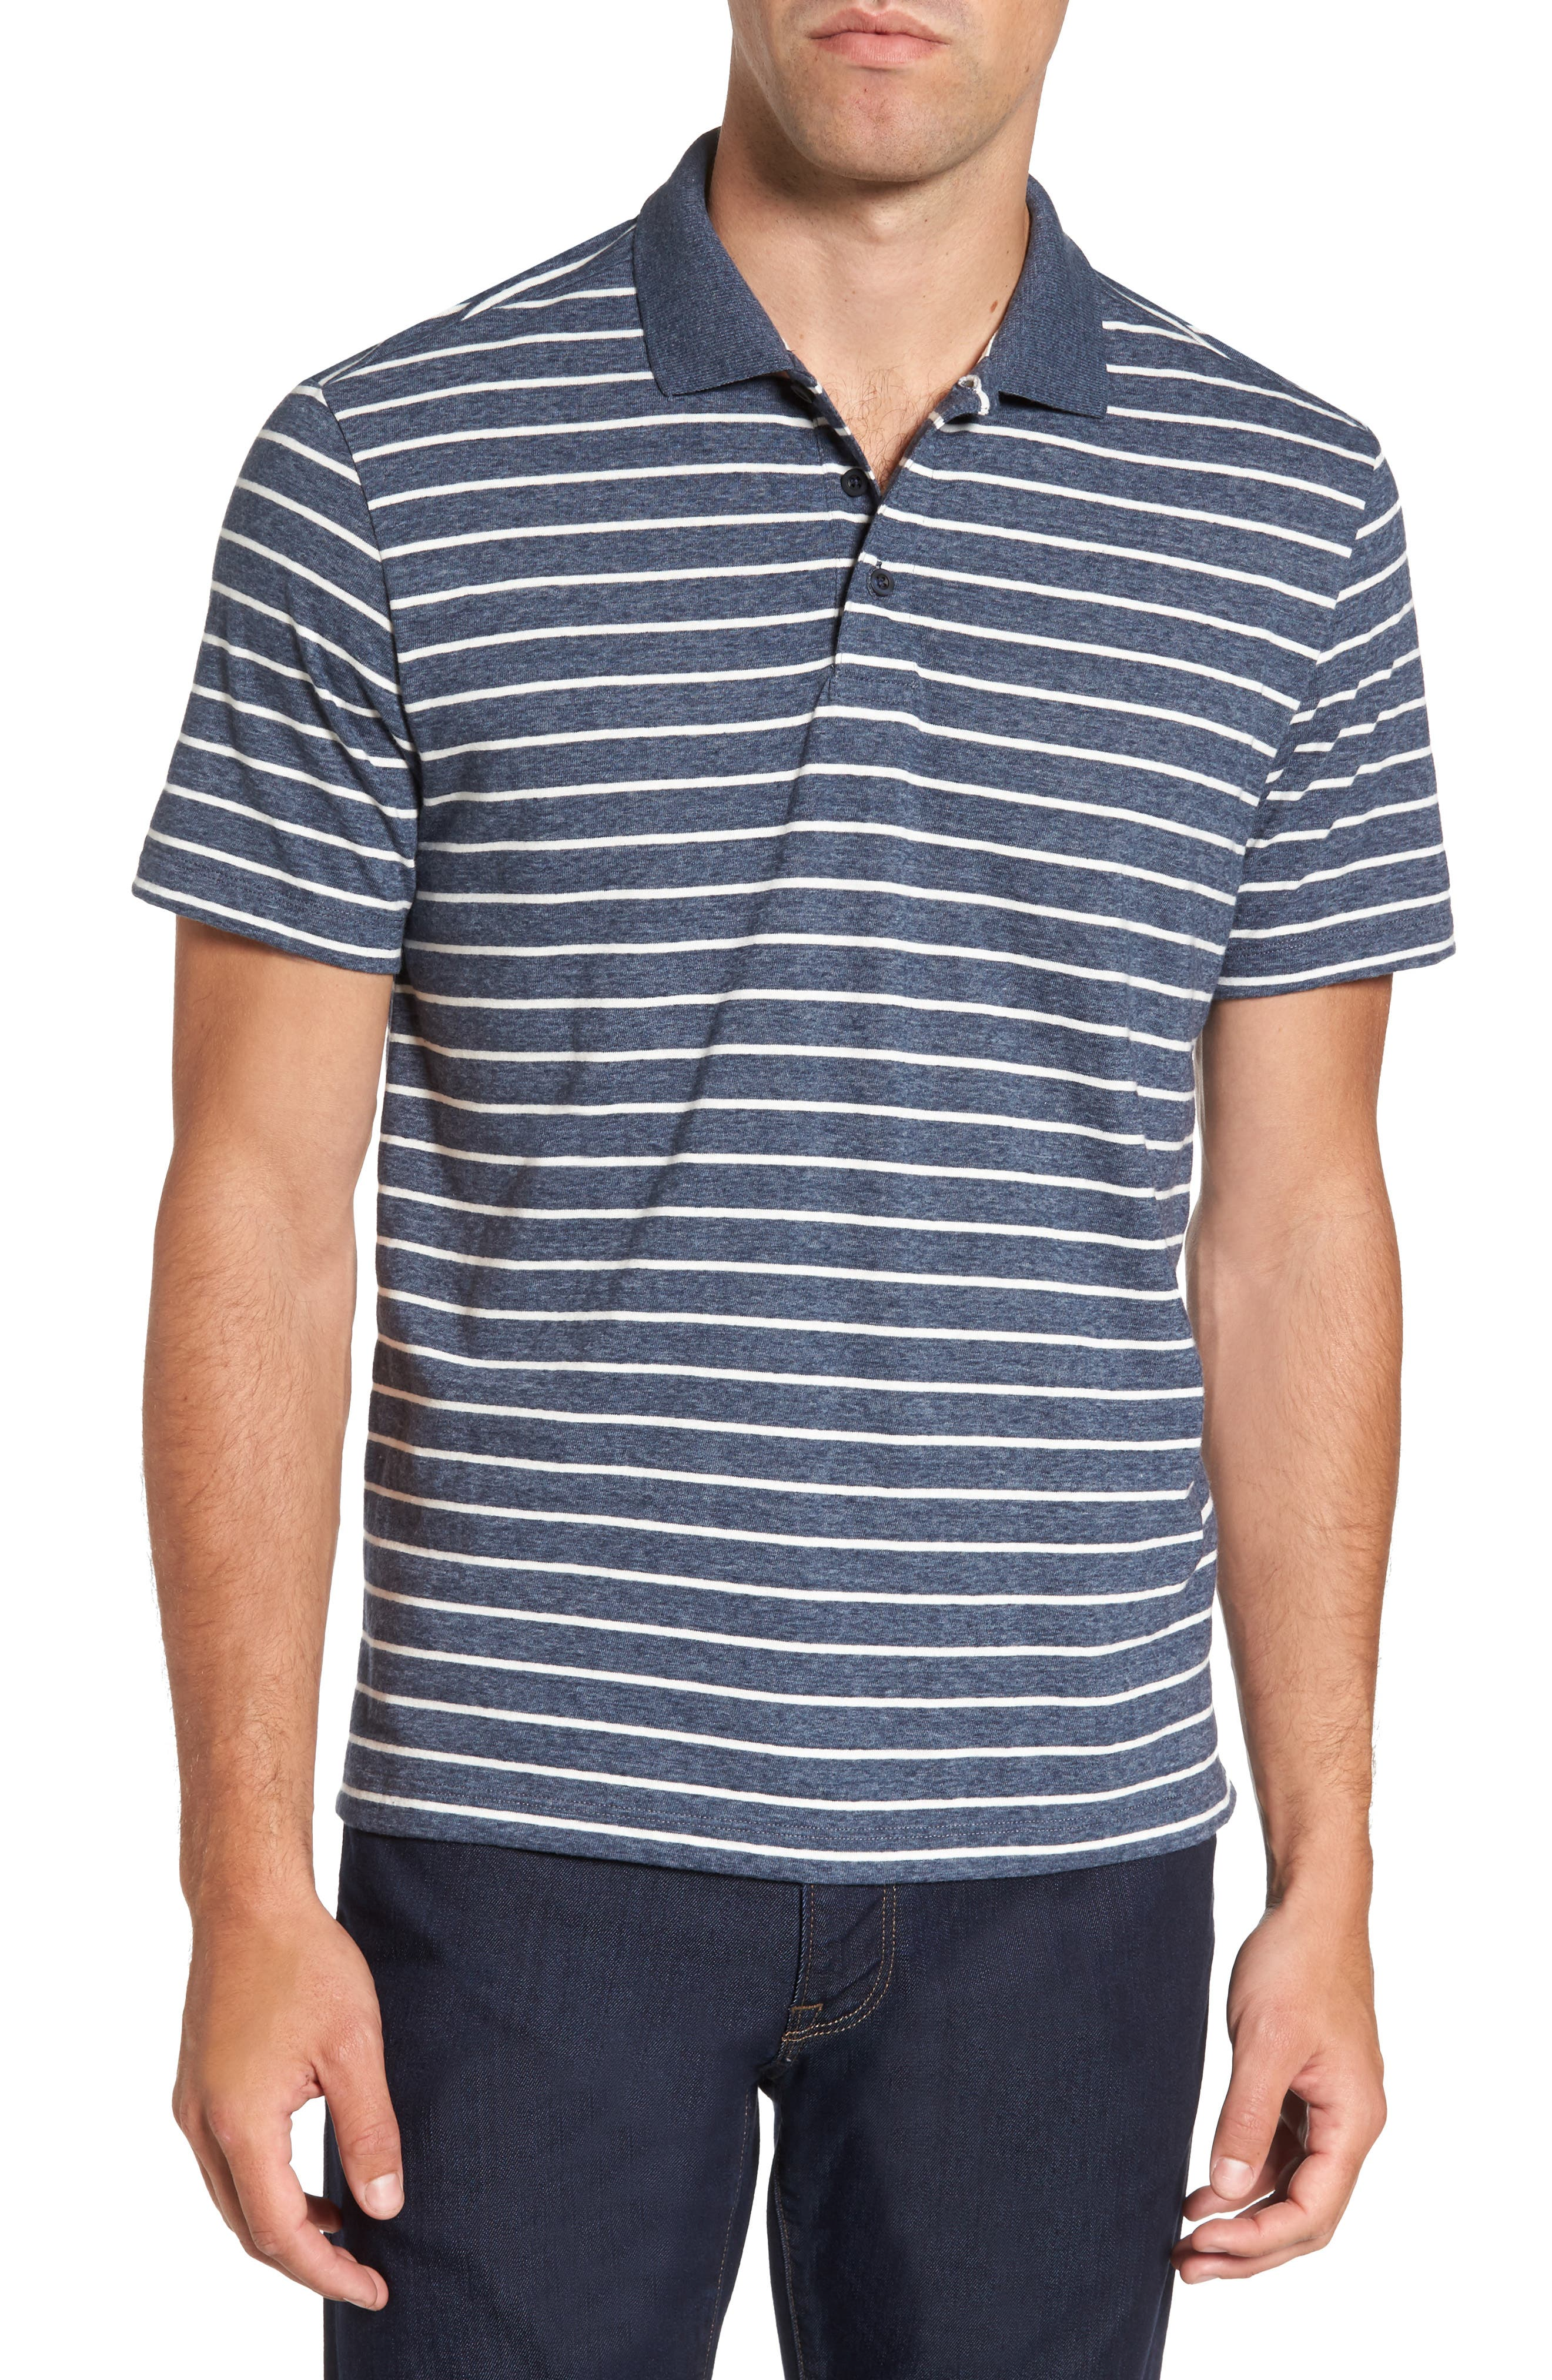 Nordstrom Men's Shop Heathered Stripe Jersey Polo